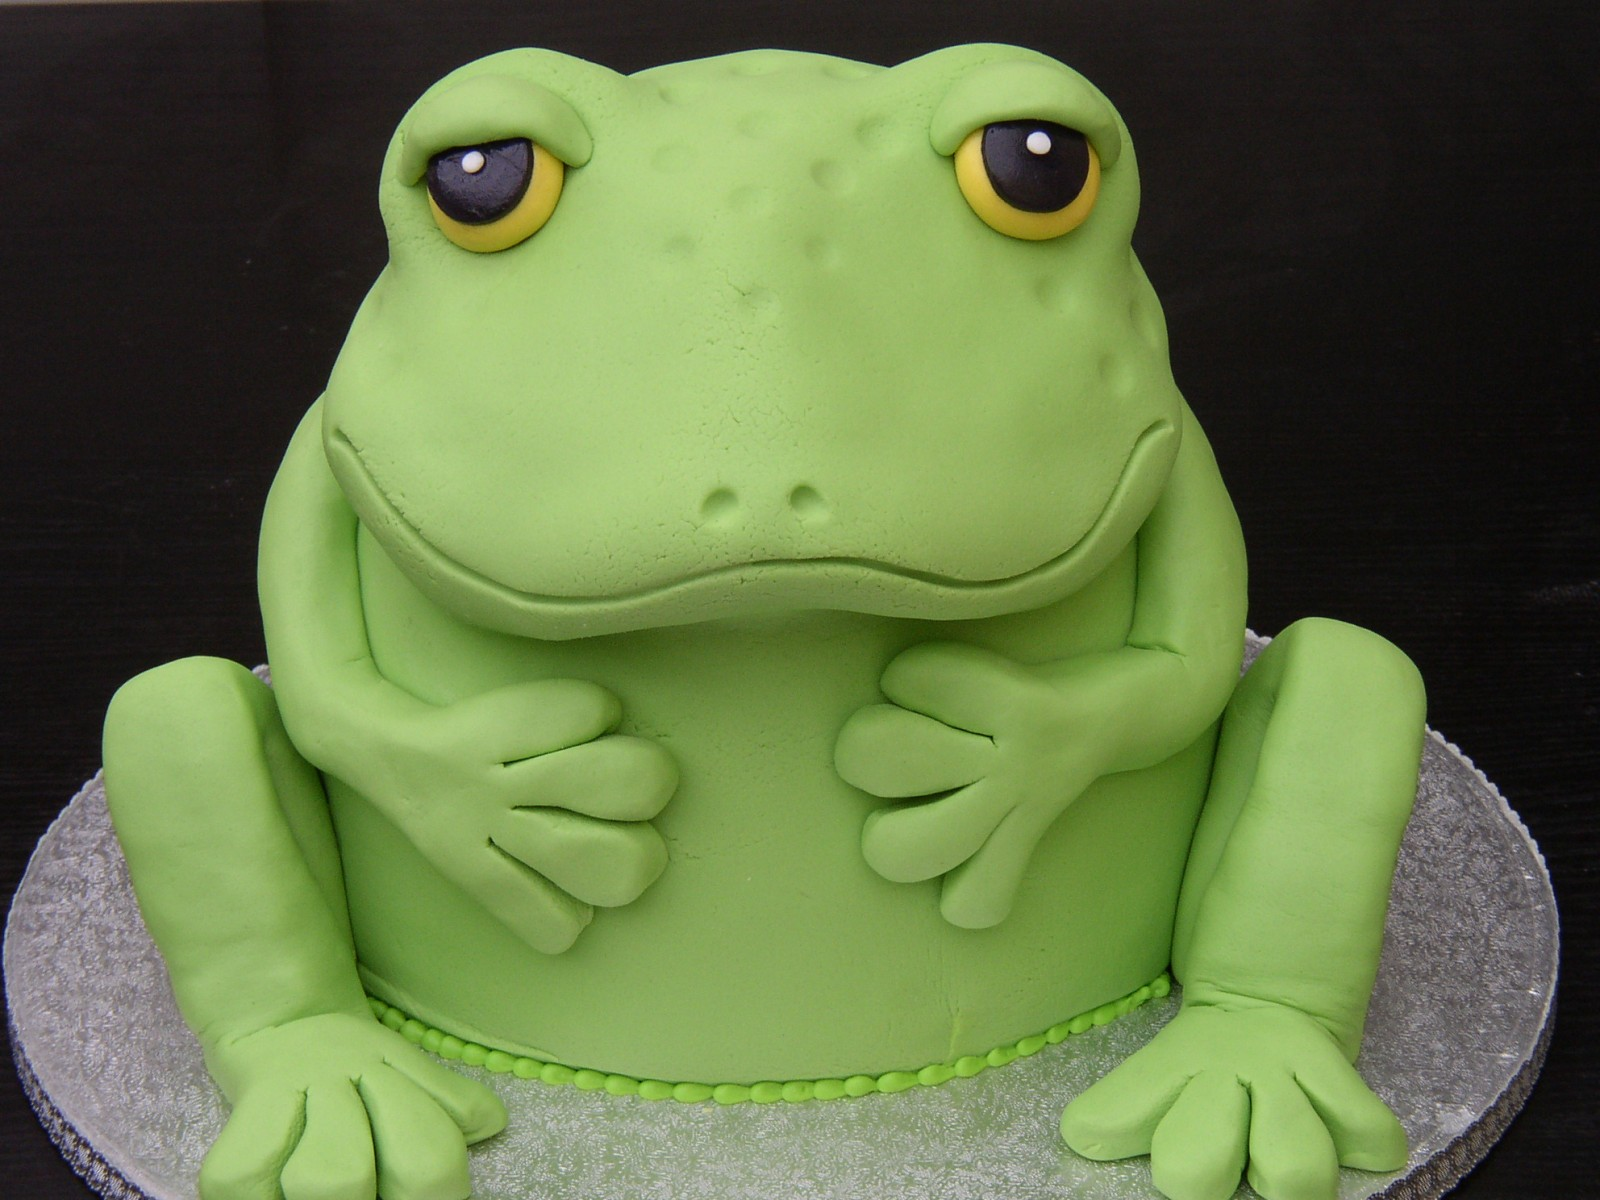 Enjoyable Giant Frog Novelty Birthday Cake Susies Cakes Funny Birthday Cards Online Necthendildamsfinfo